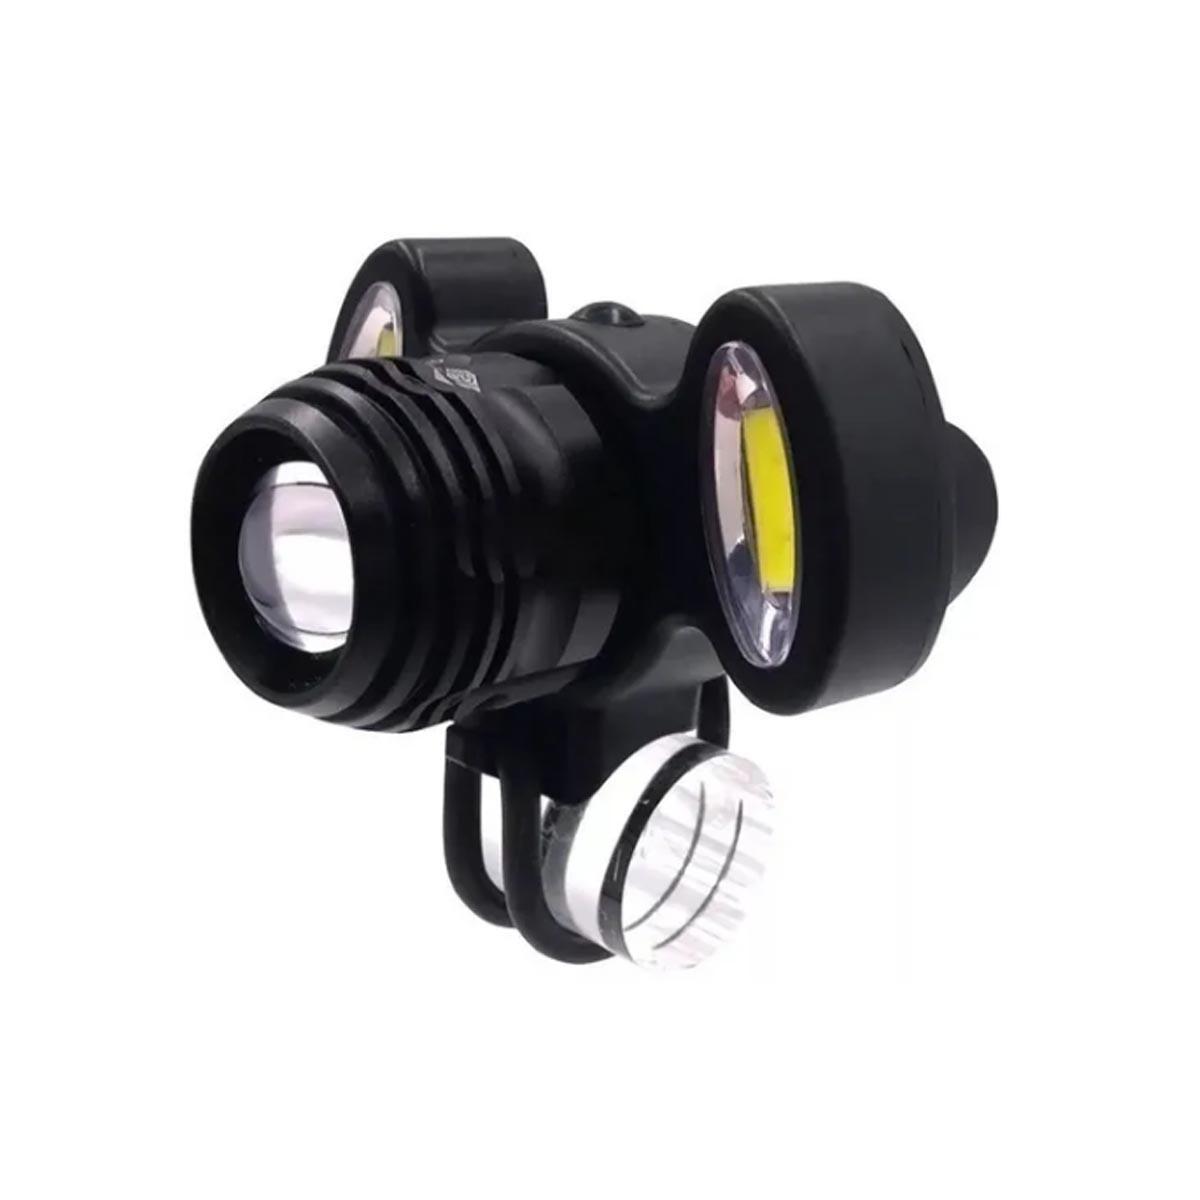 FAROL BIKE LIGHTS JY-8858 RECARREGAVEL USB